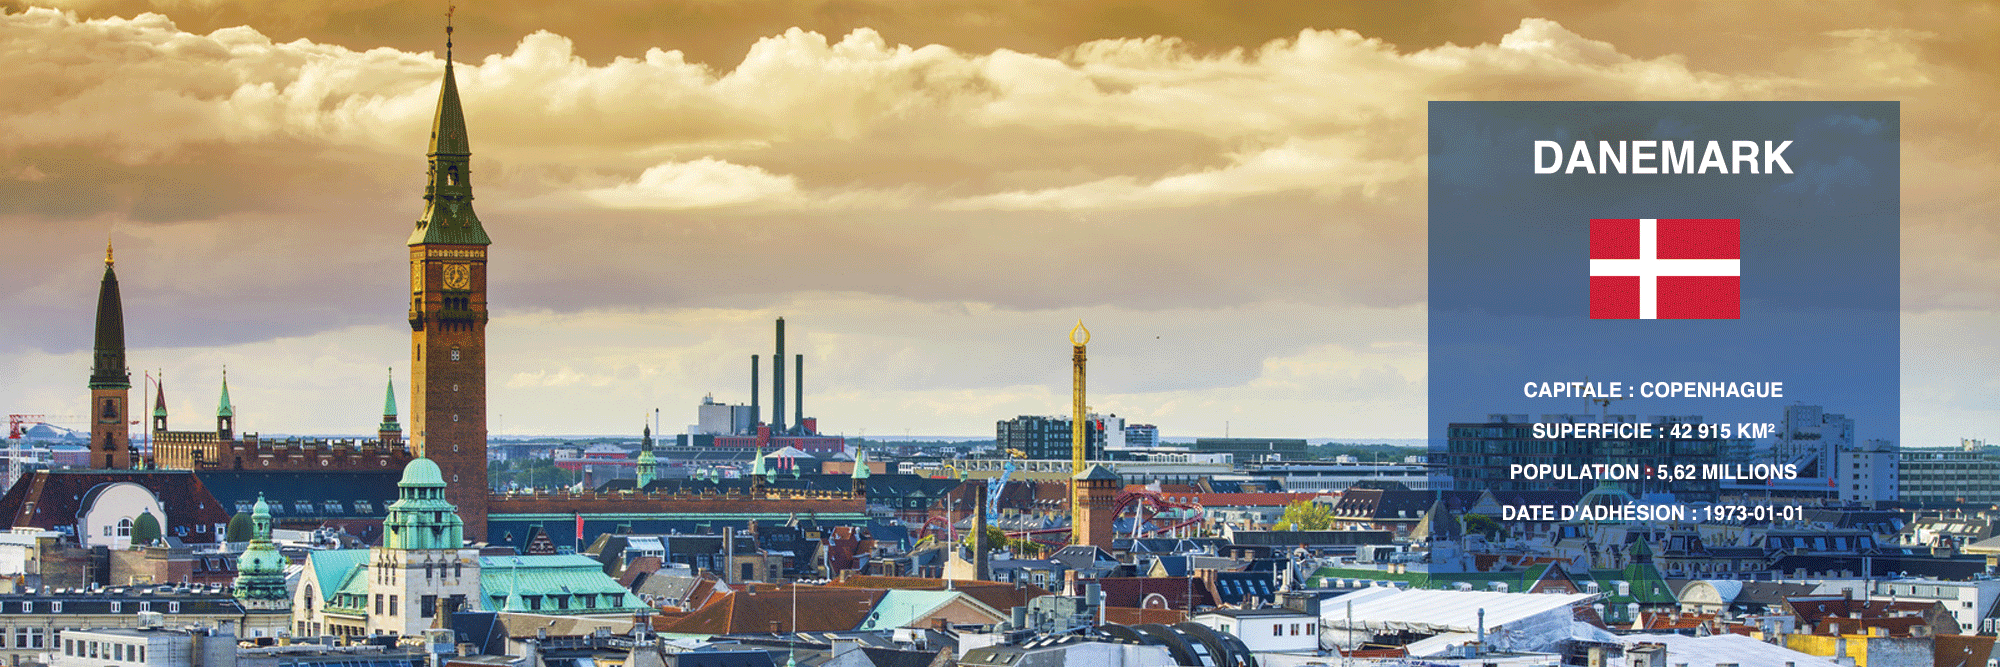 Copenhague.png